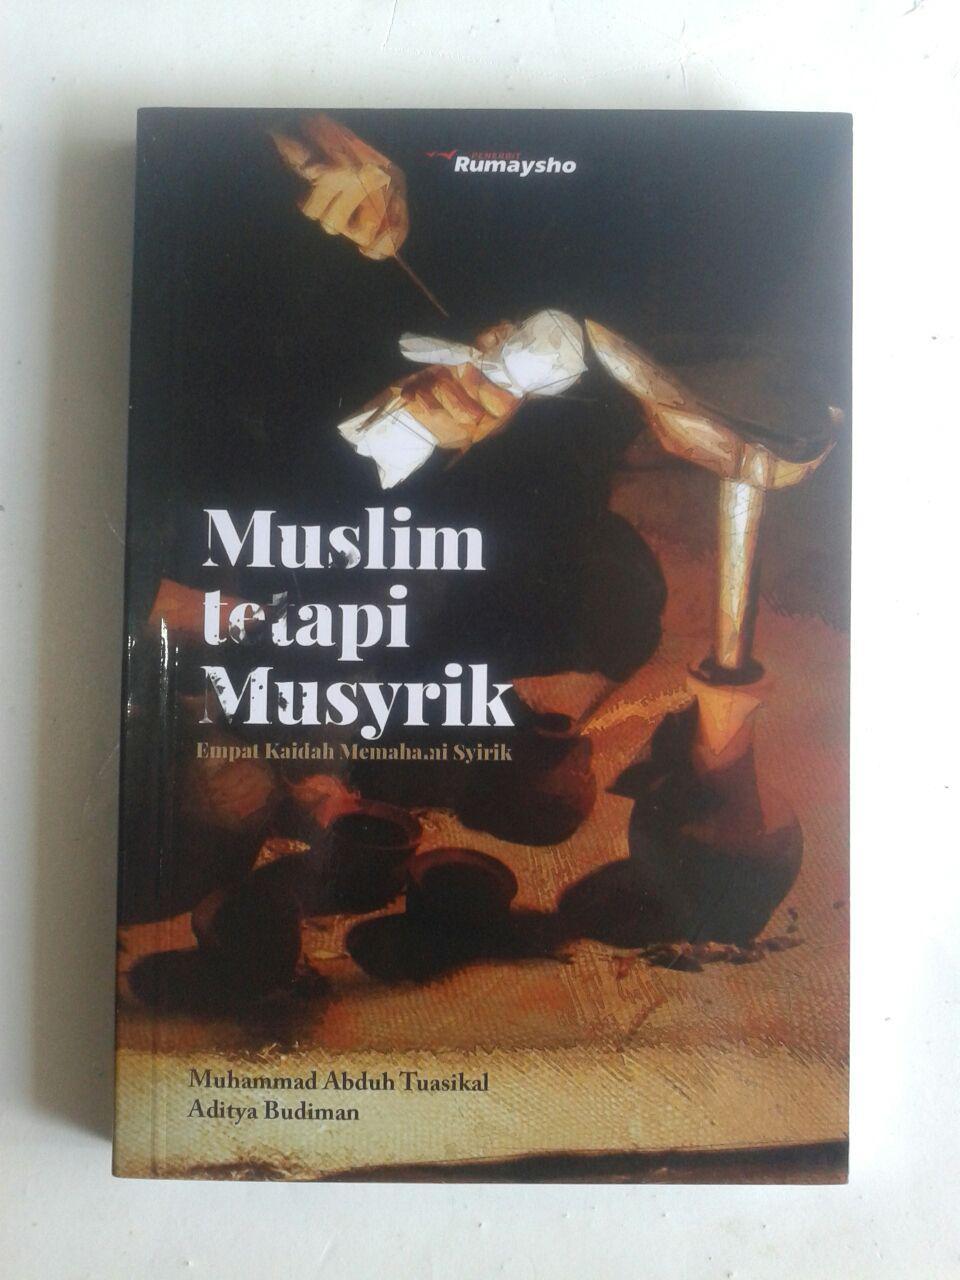 Buku Muslim Tetapi Musyrik Empat Kaidah Memahami Syirik cover 2